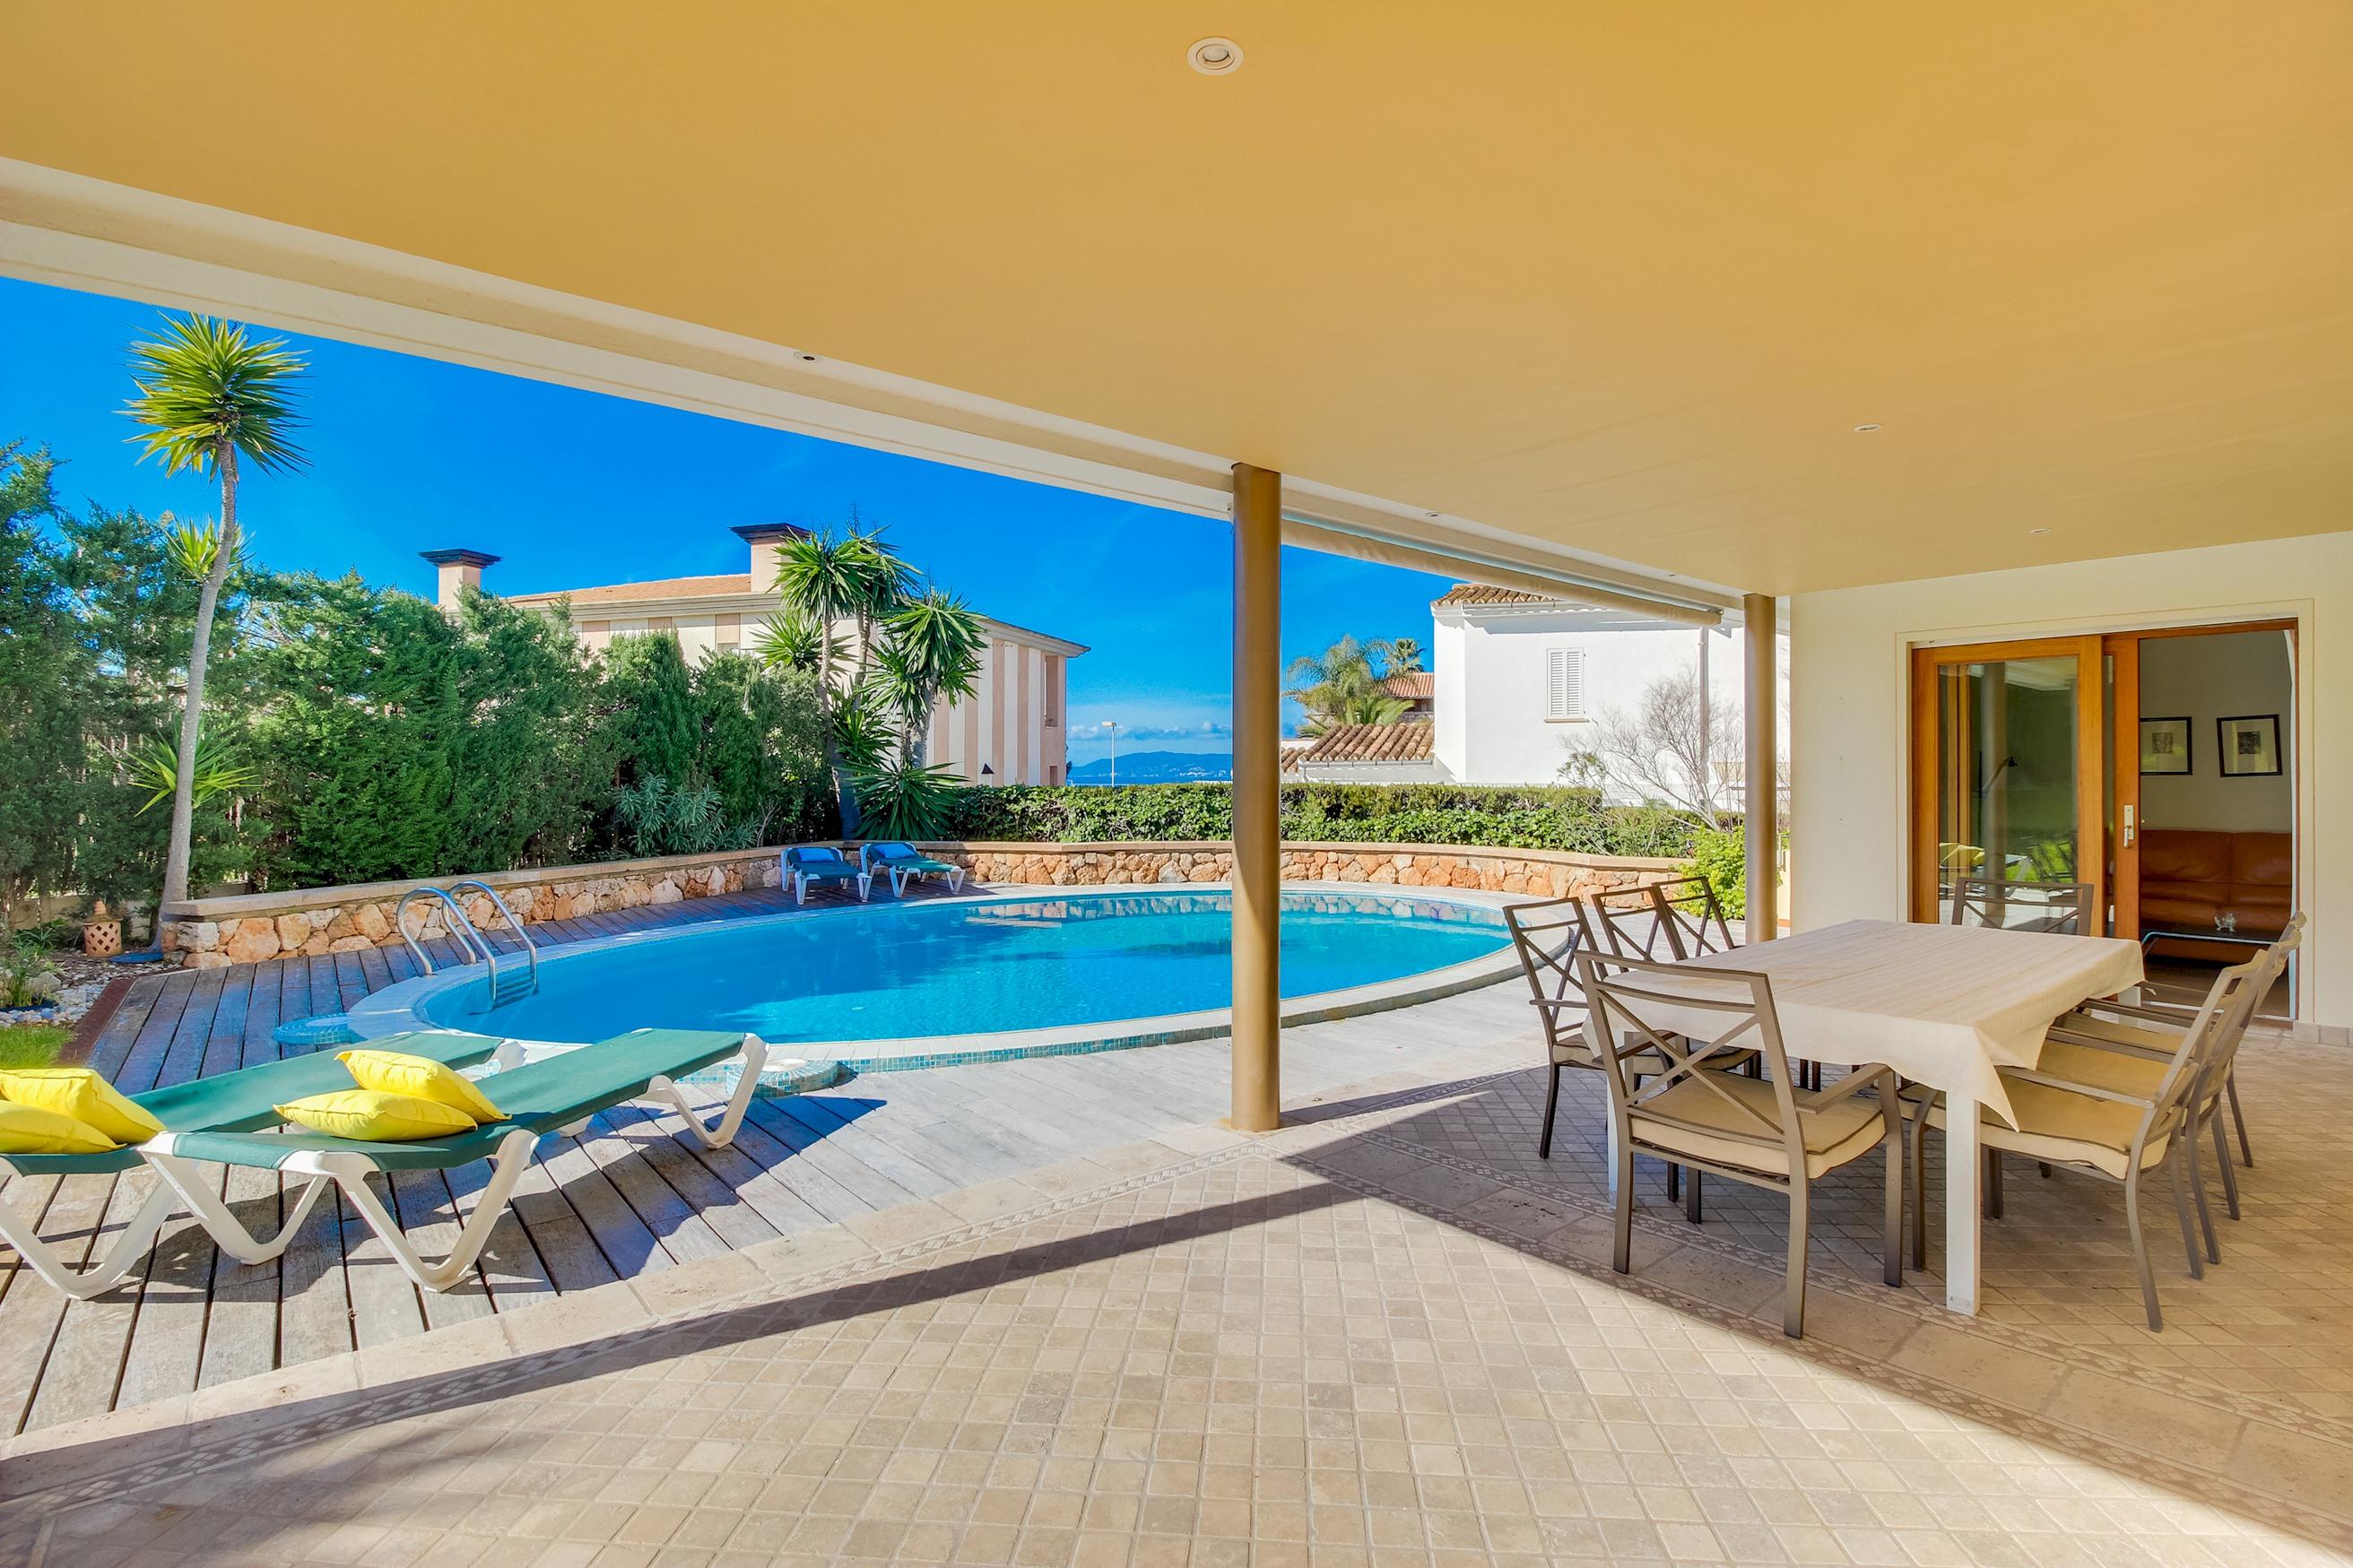 Apartment Villa Cala Blava photo 20399465